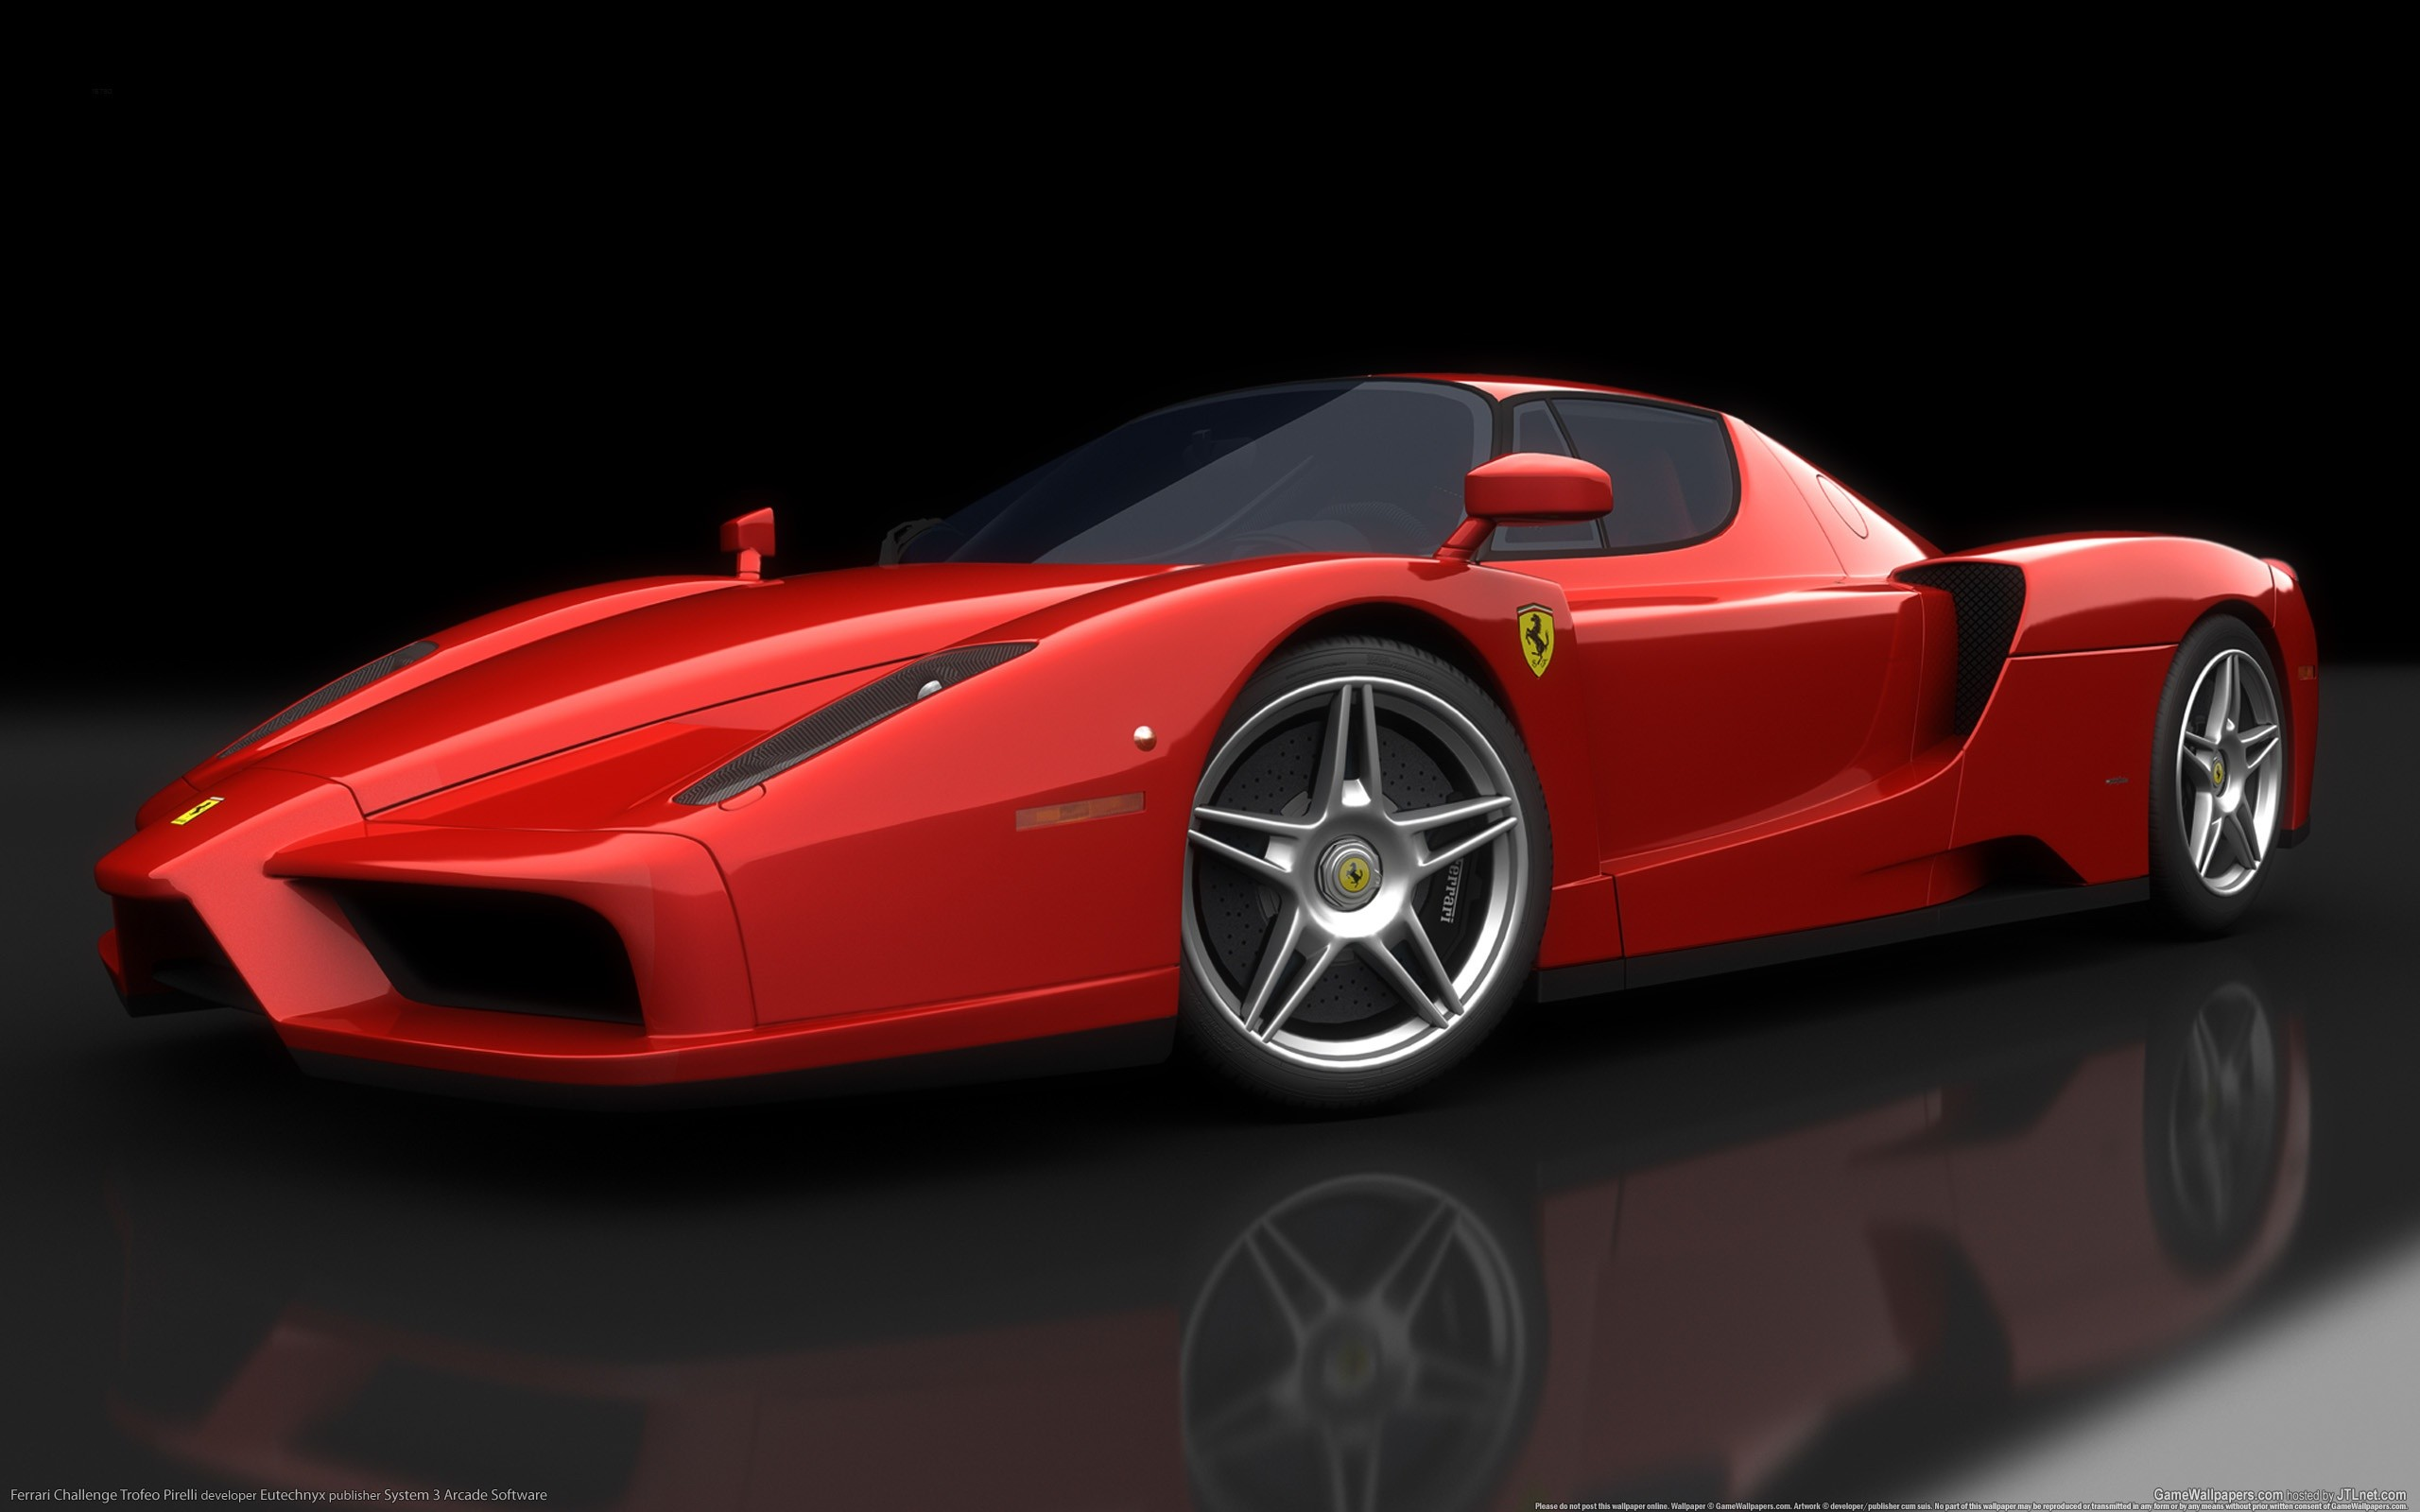 2 Ferrari Challenge Trofeo Pirelli HD Wallpapers   Backgrounds – Wallpaper  Abyss